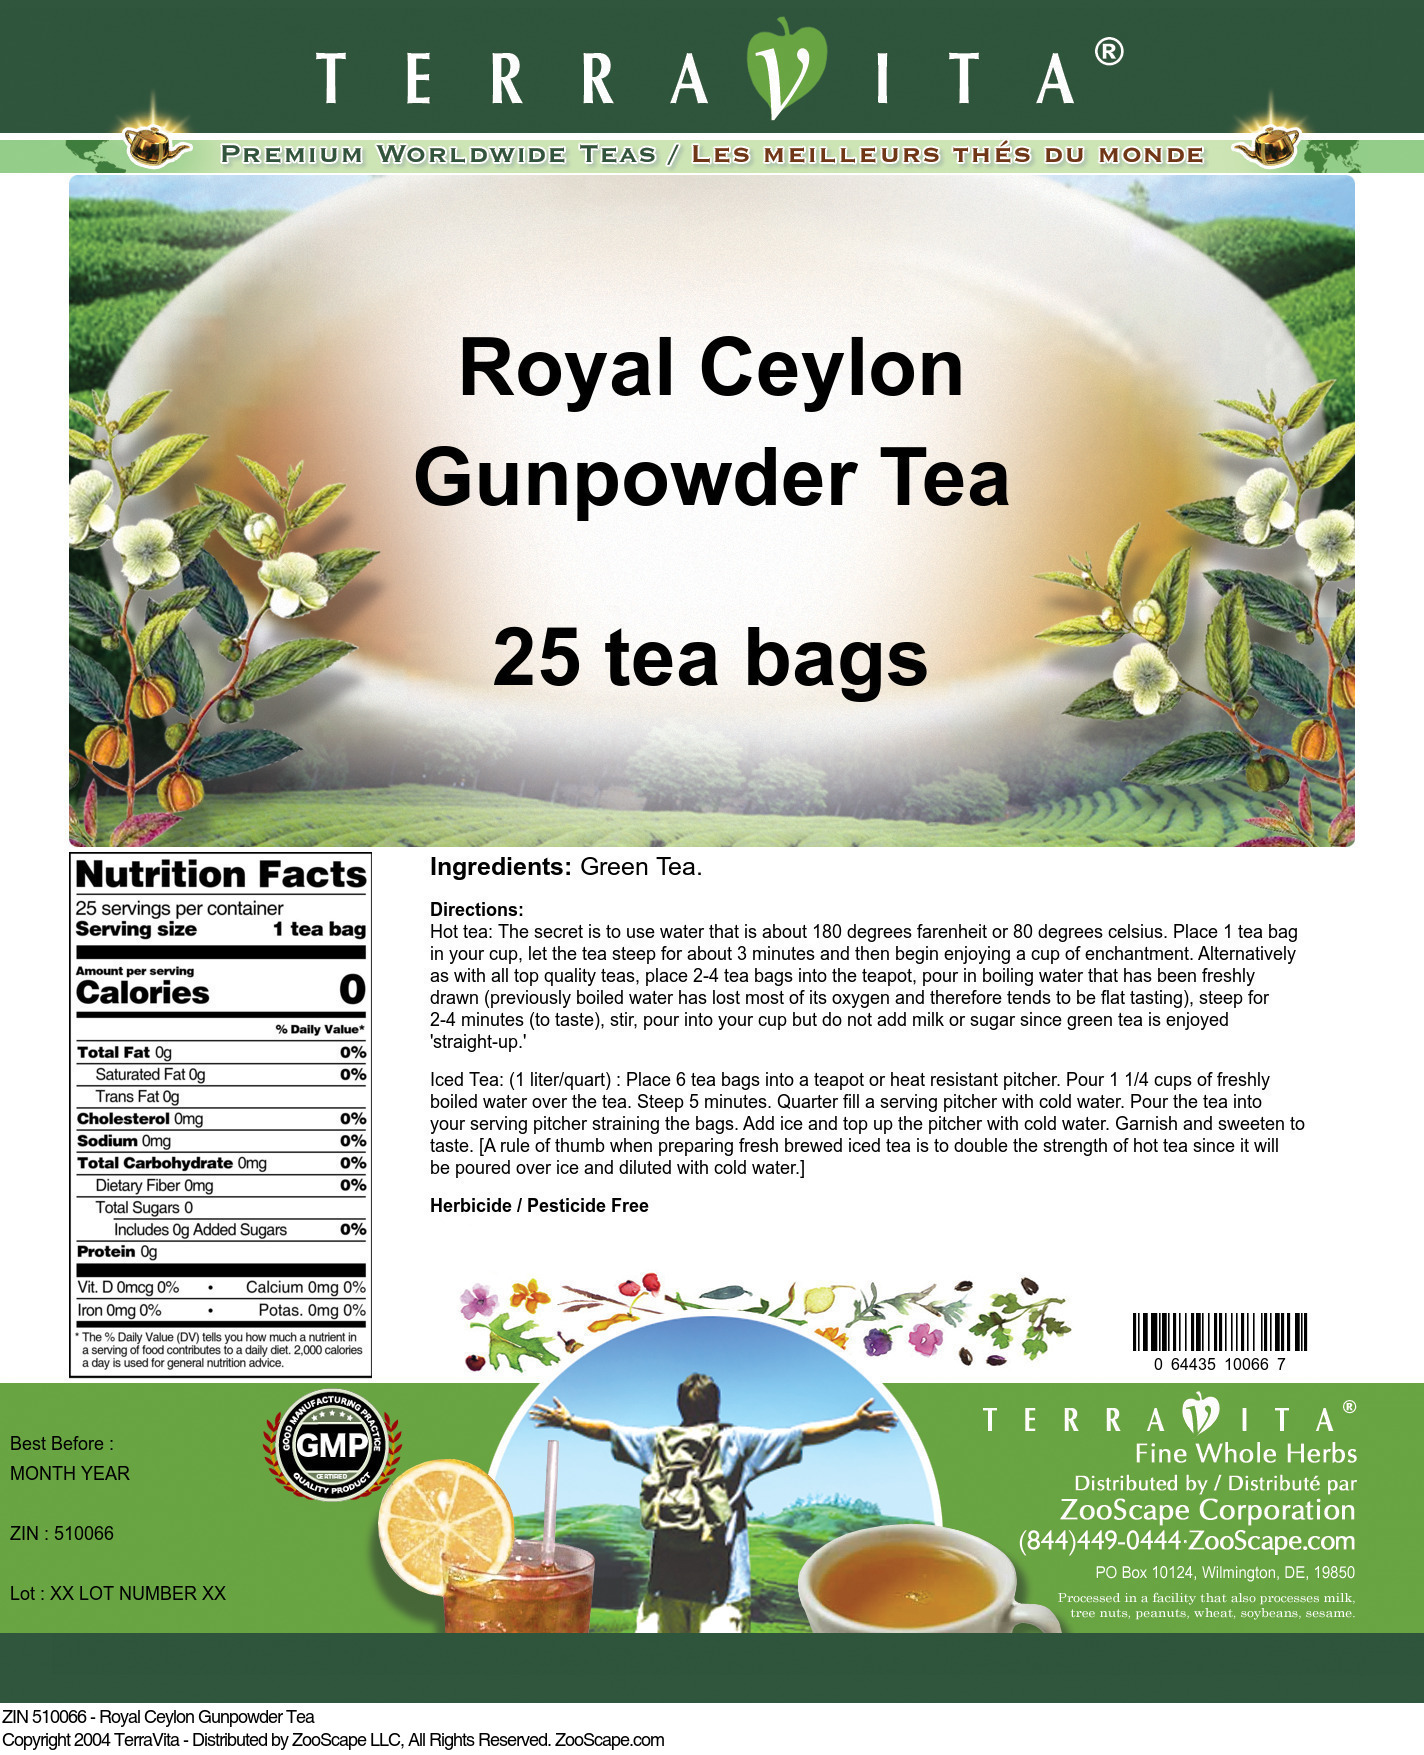 Royal Ceylon Gunpowder Tea